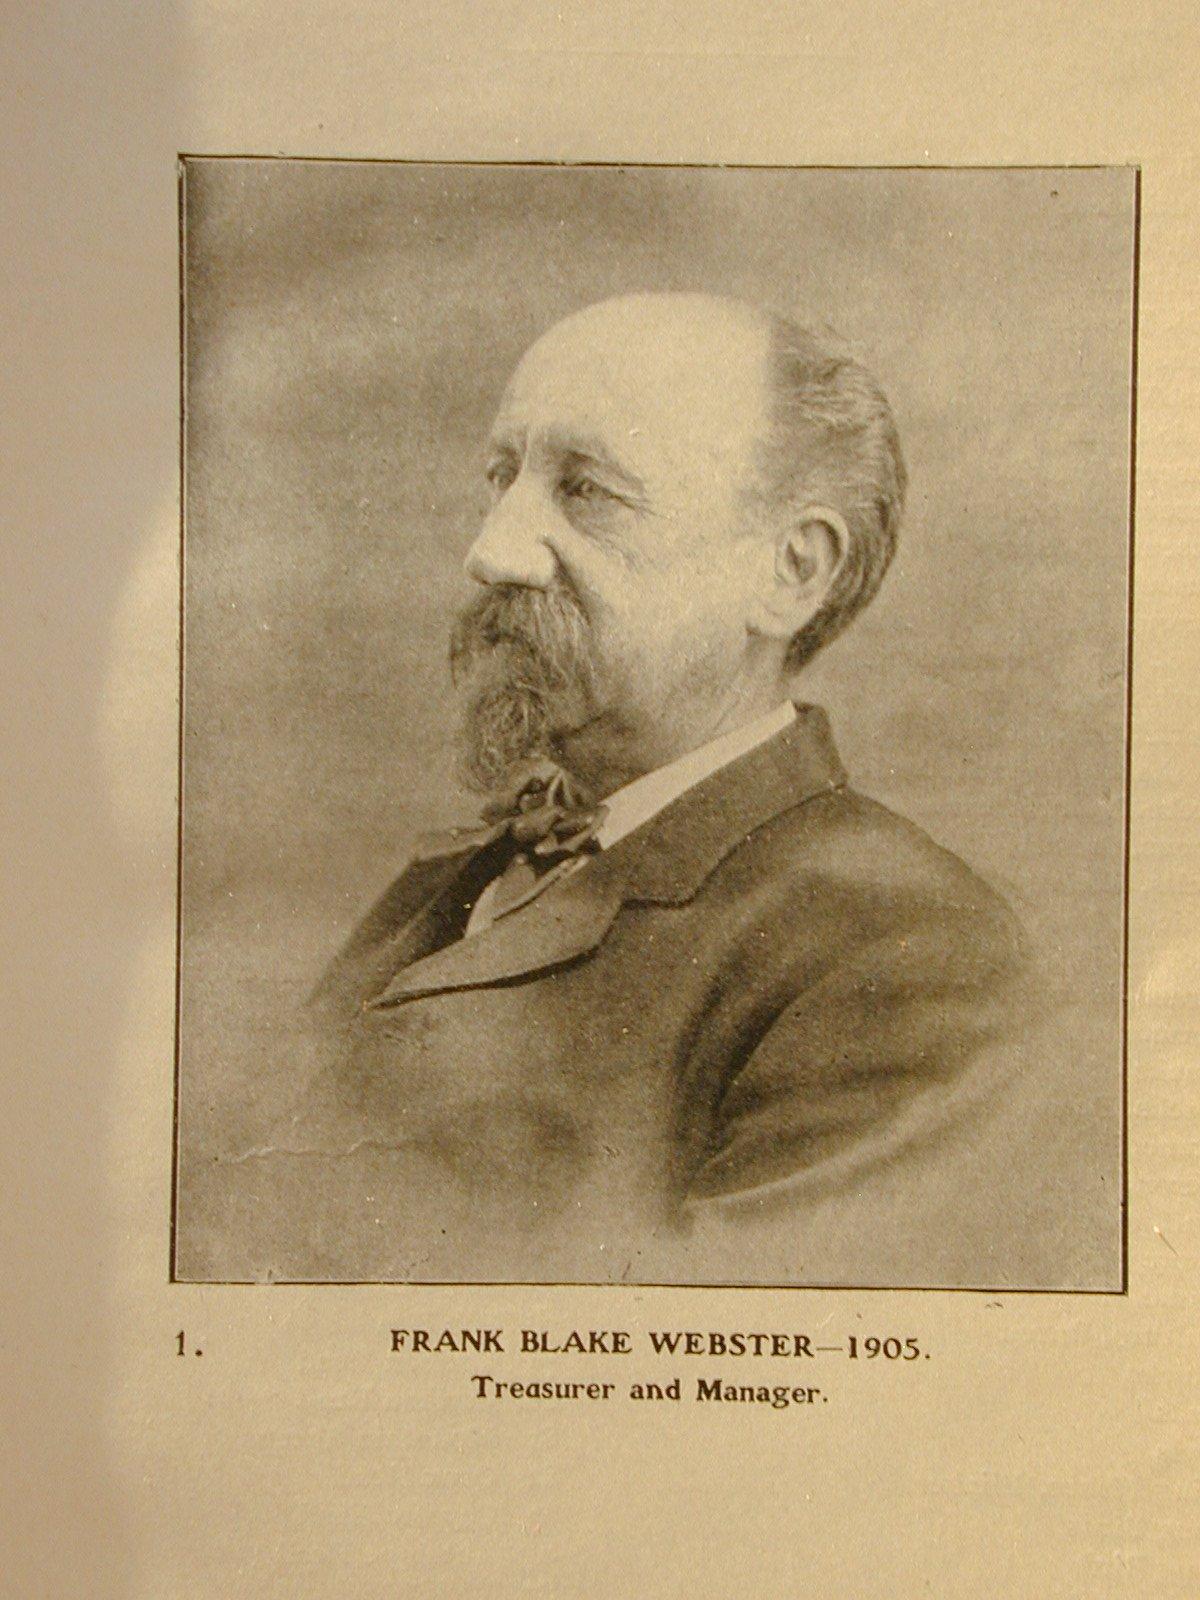 Frank Blake Webster 1905.JPG